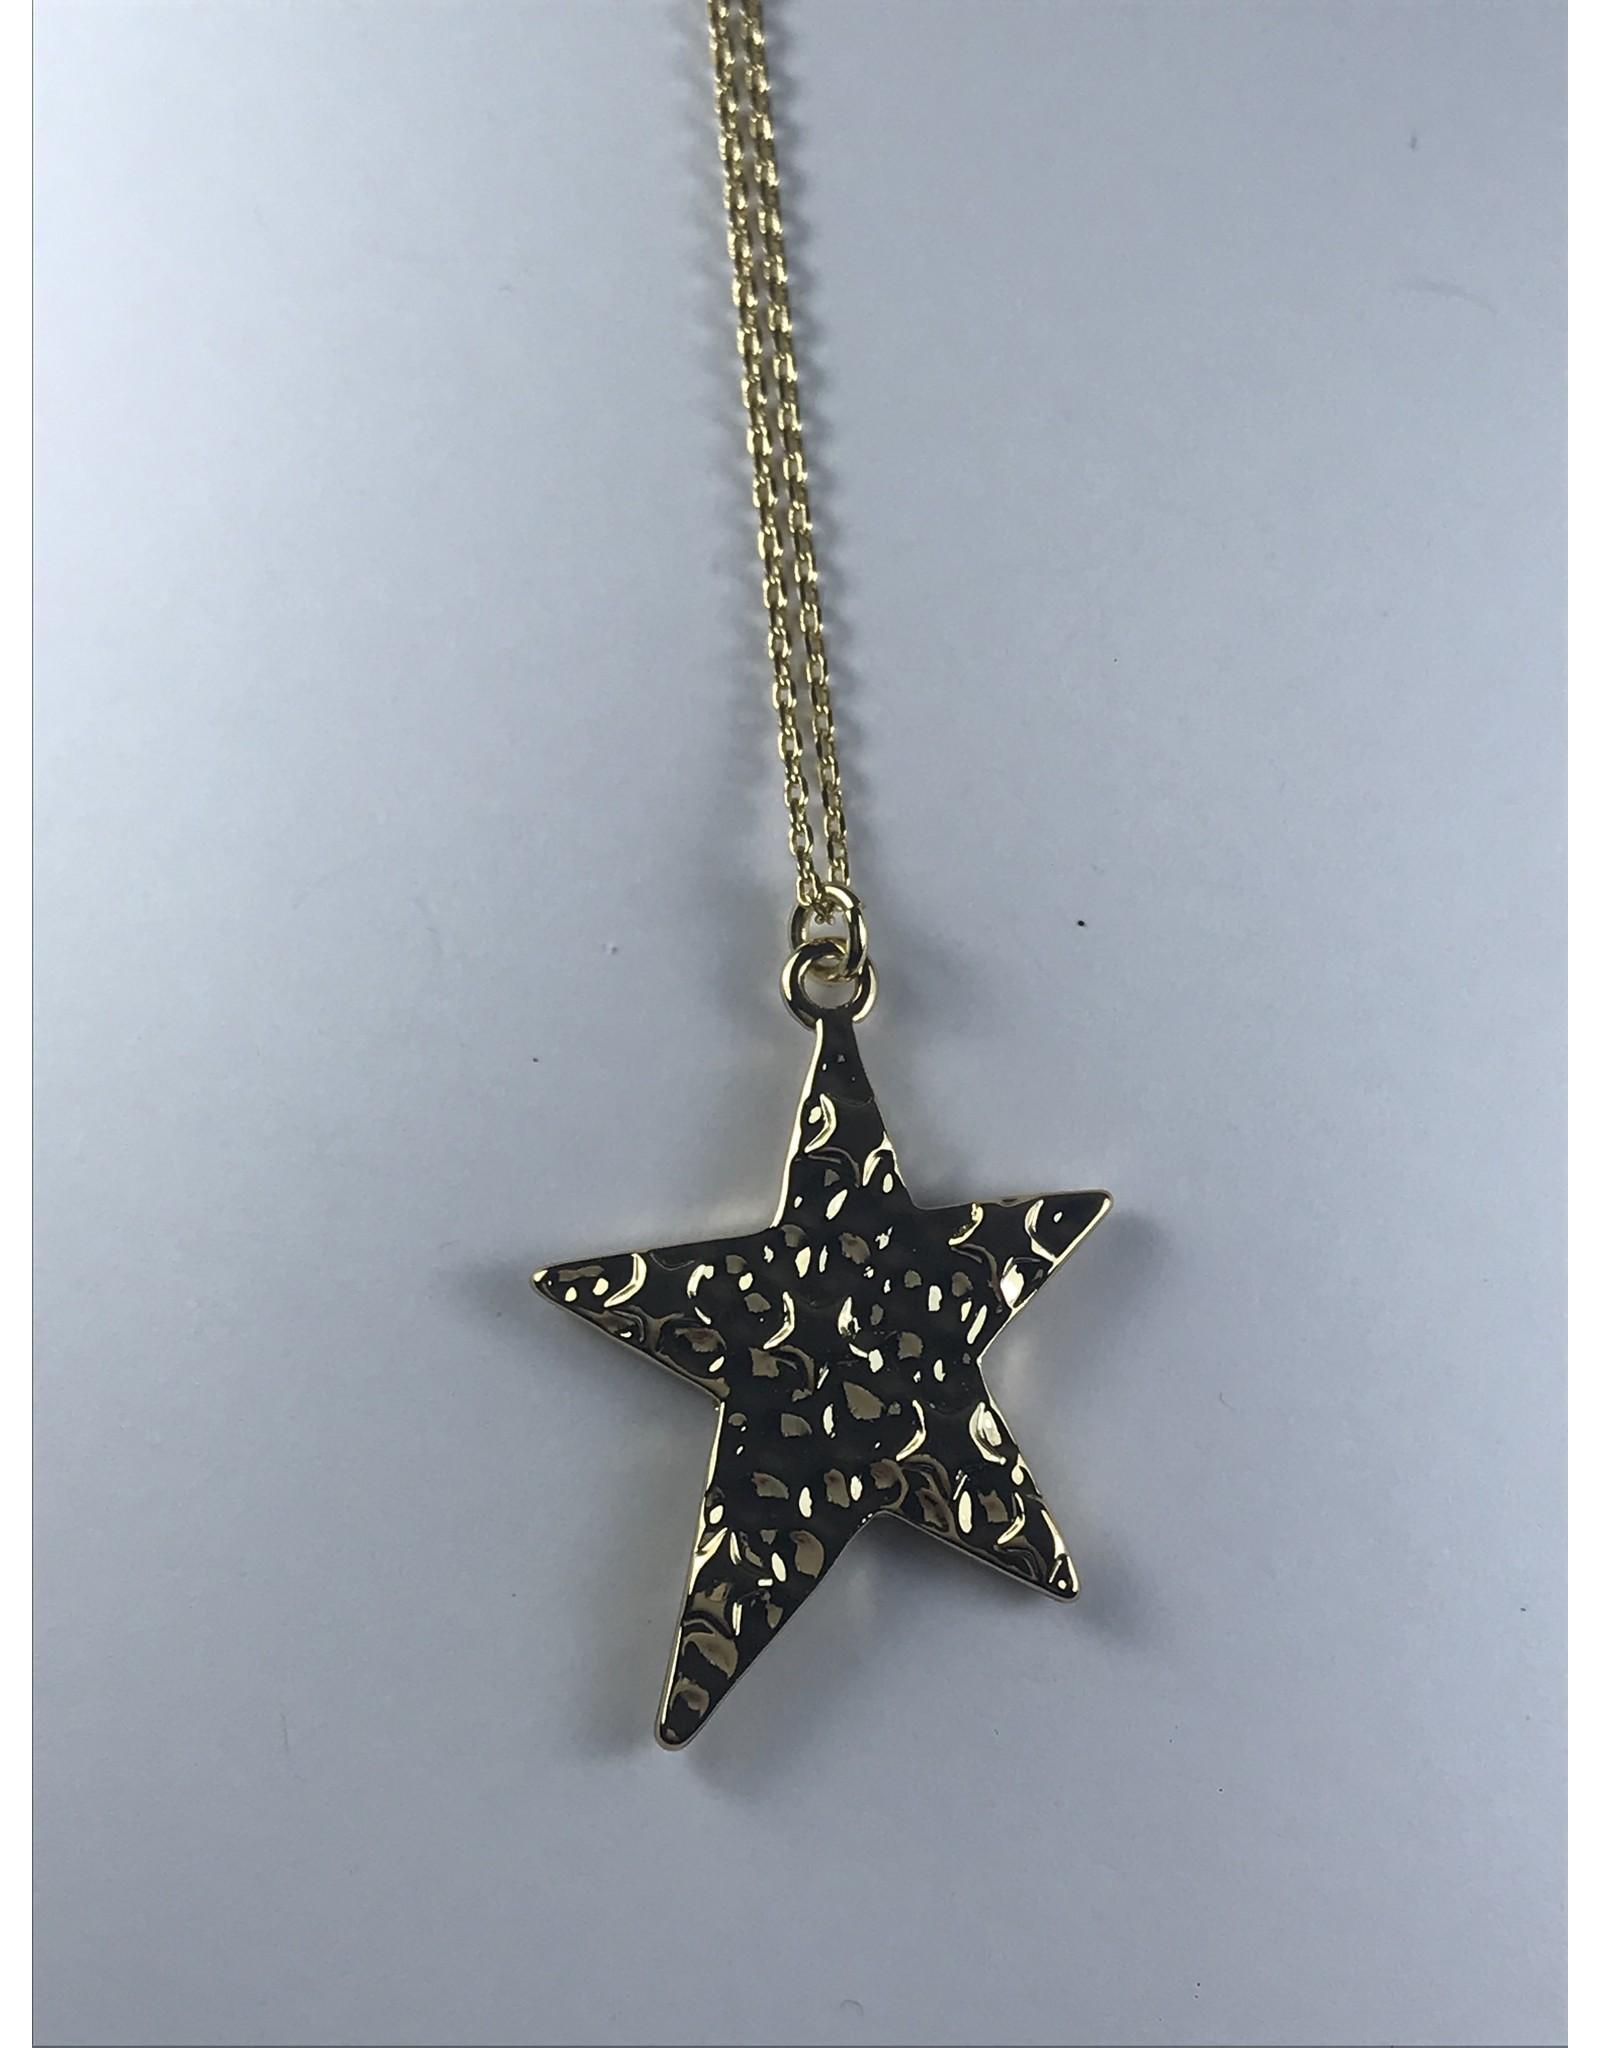 Axxes-Soir korte  goudkleurige ketting met ster